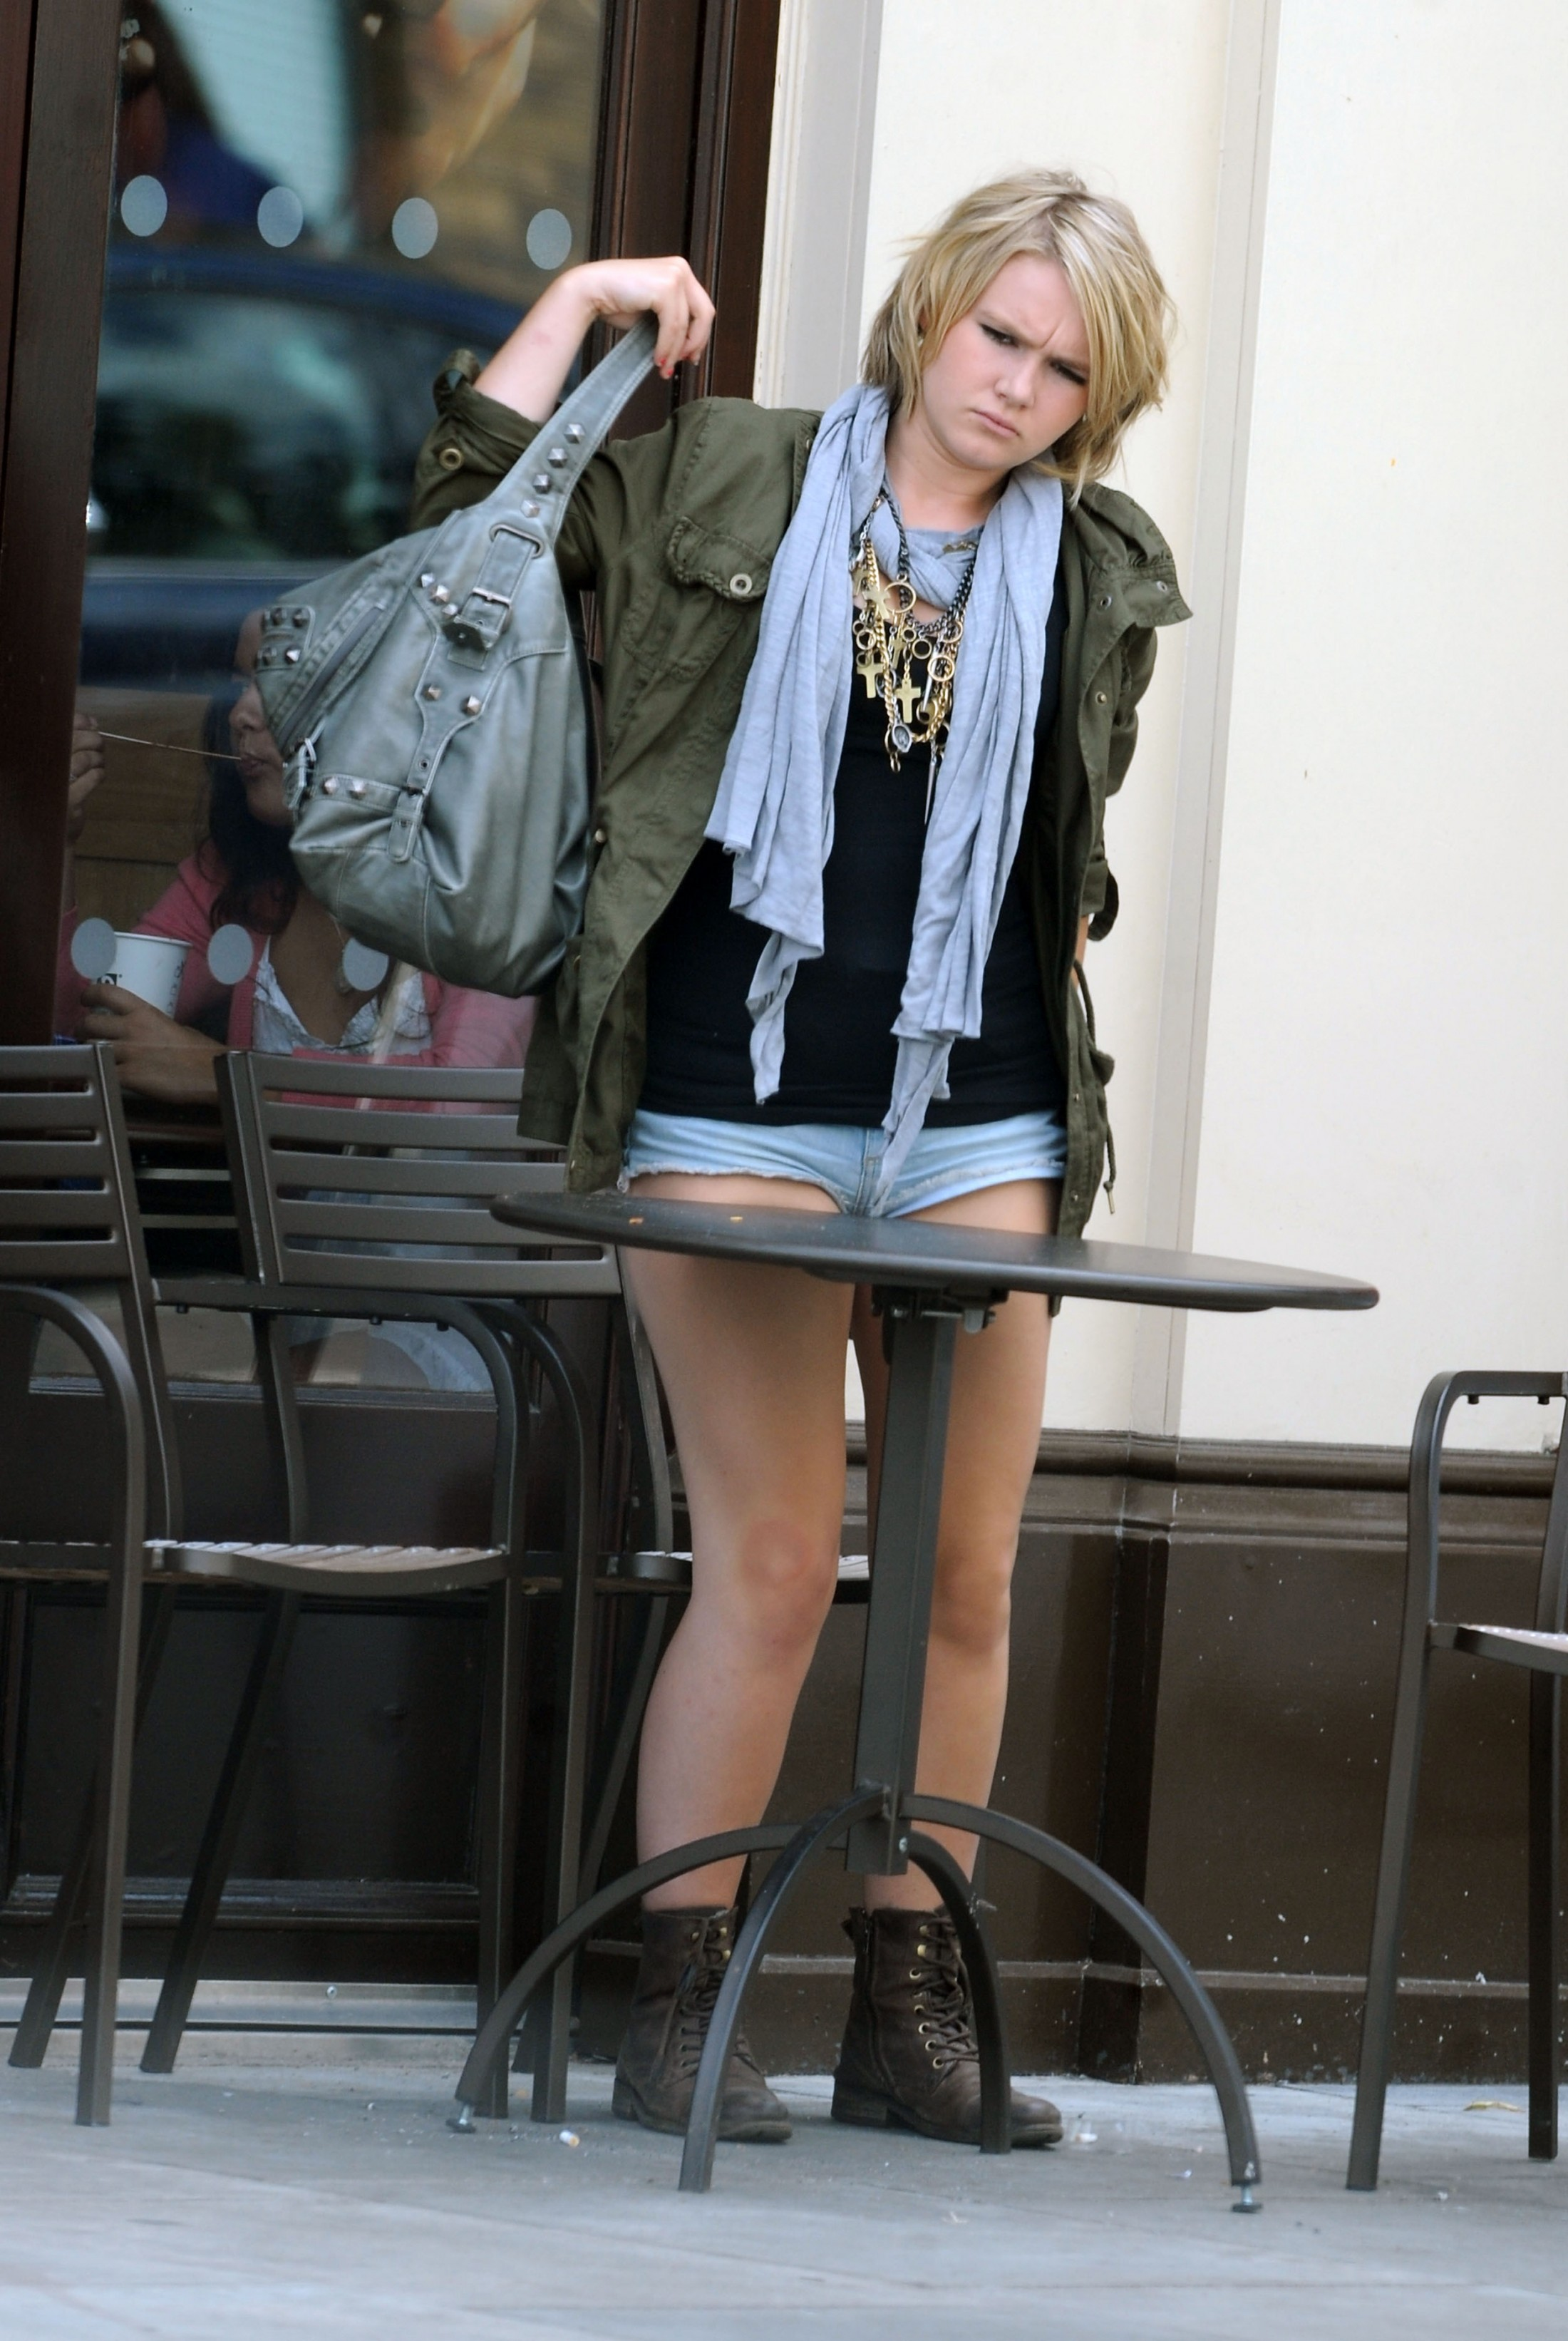 melissa-suffield-short-shorts-candids-starbucks-london-24 ...